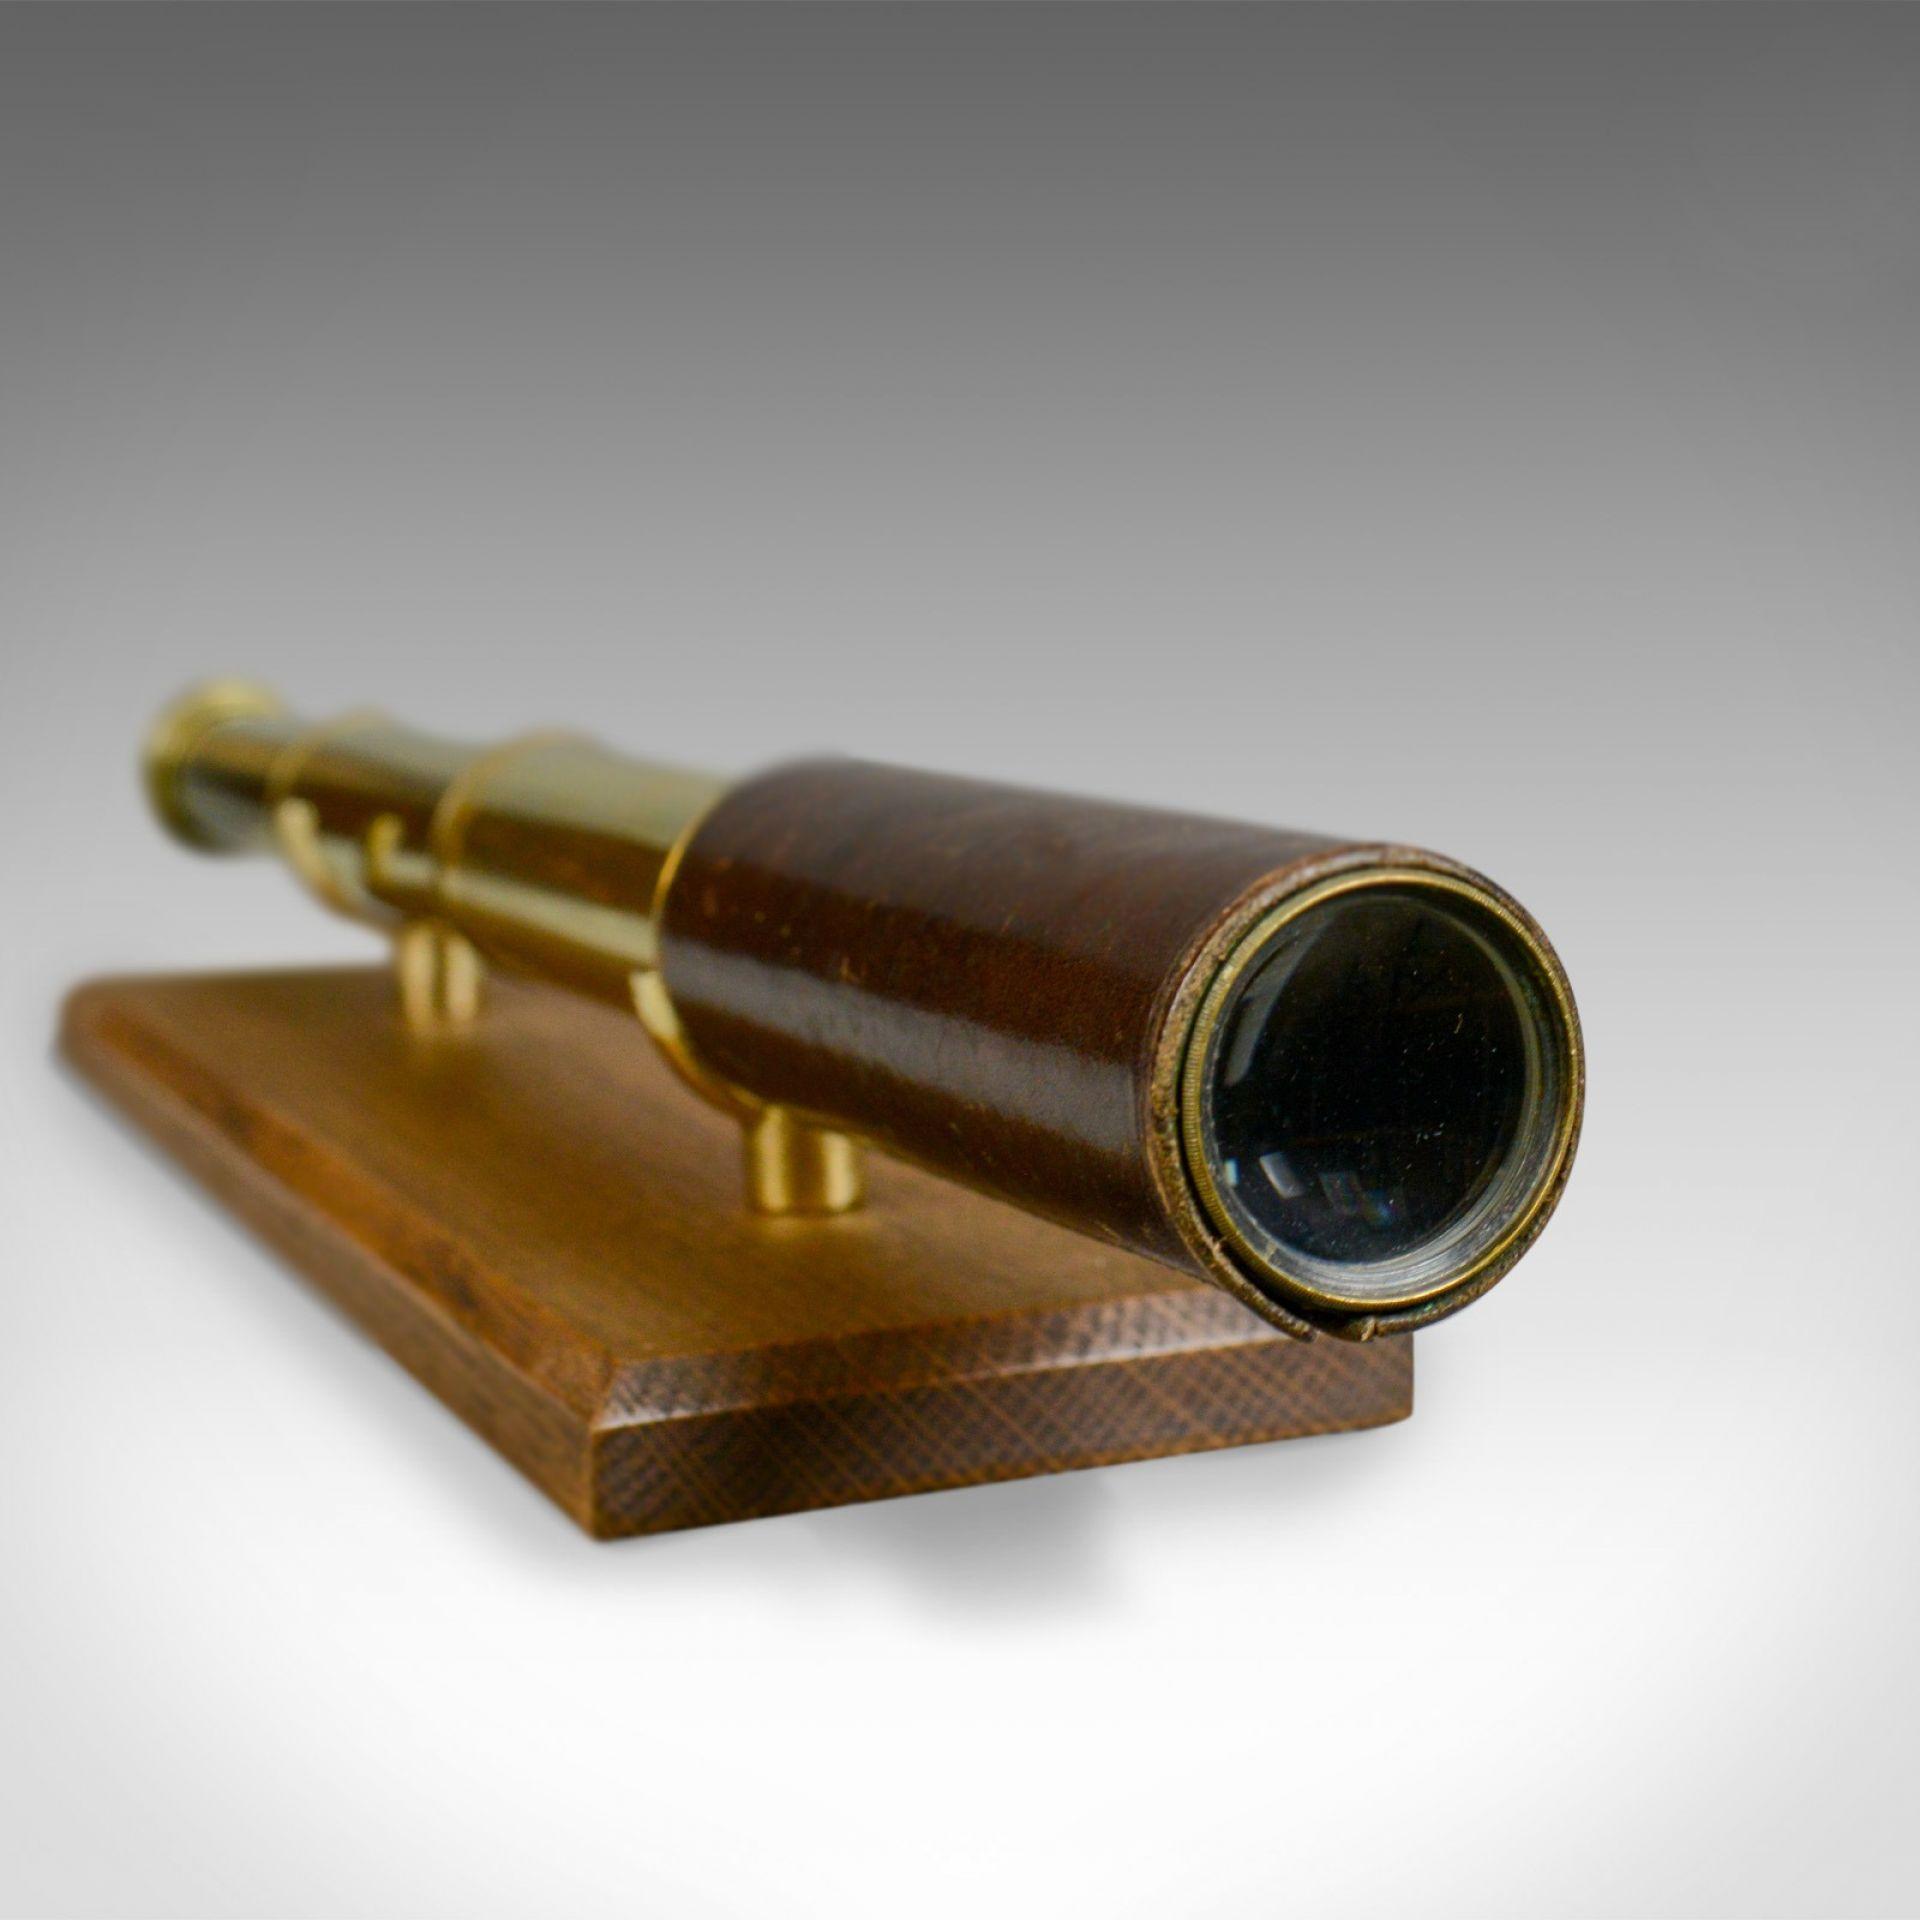 Antique Telescope, 3 Draw, Pocket Refractor, Broadhurst Clarkson, 20th Century